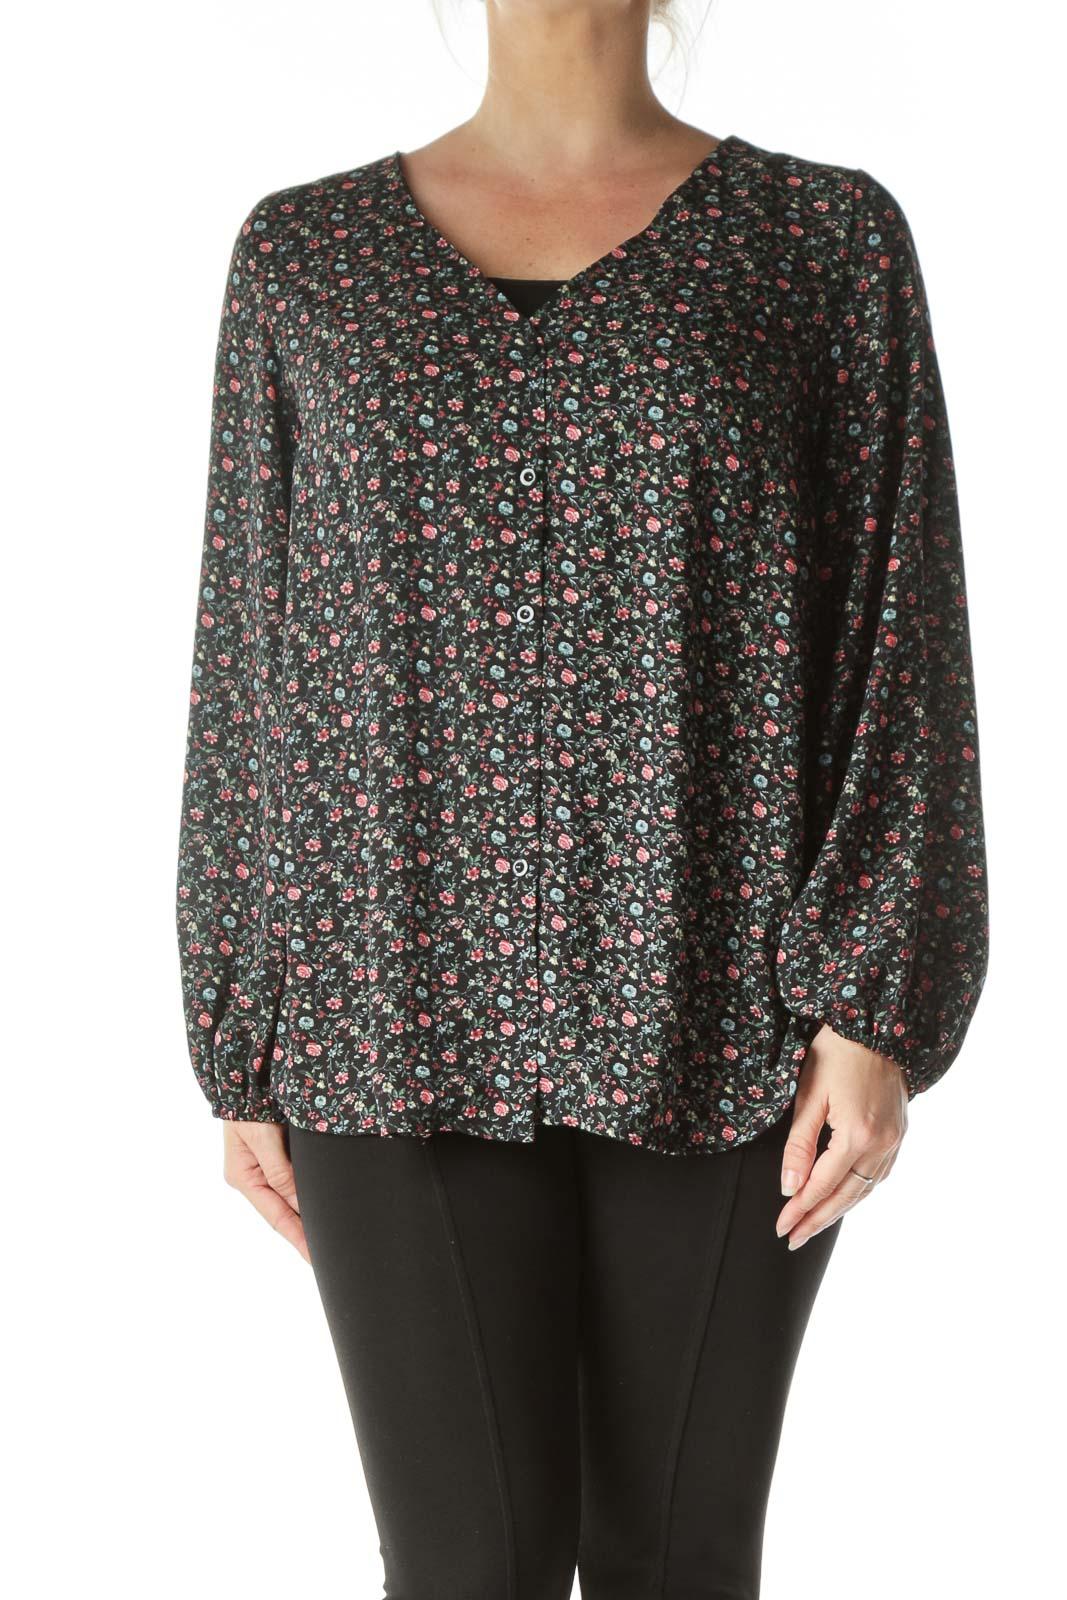 Black Floral Long Sleeve Blouse Front